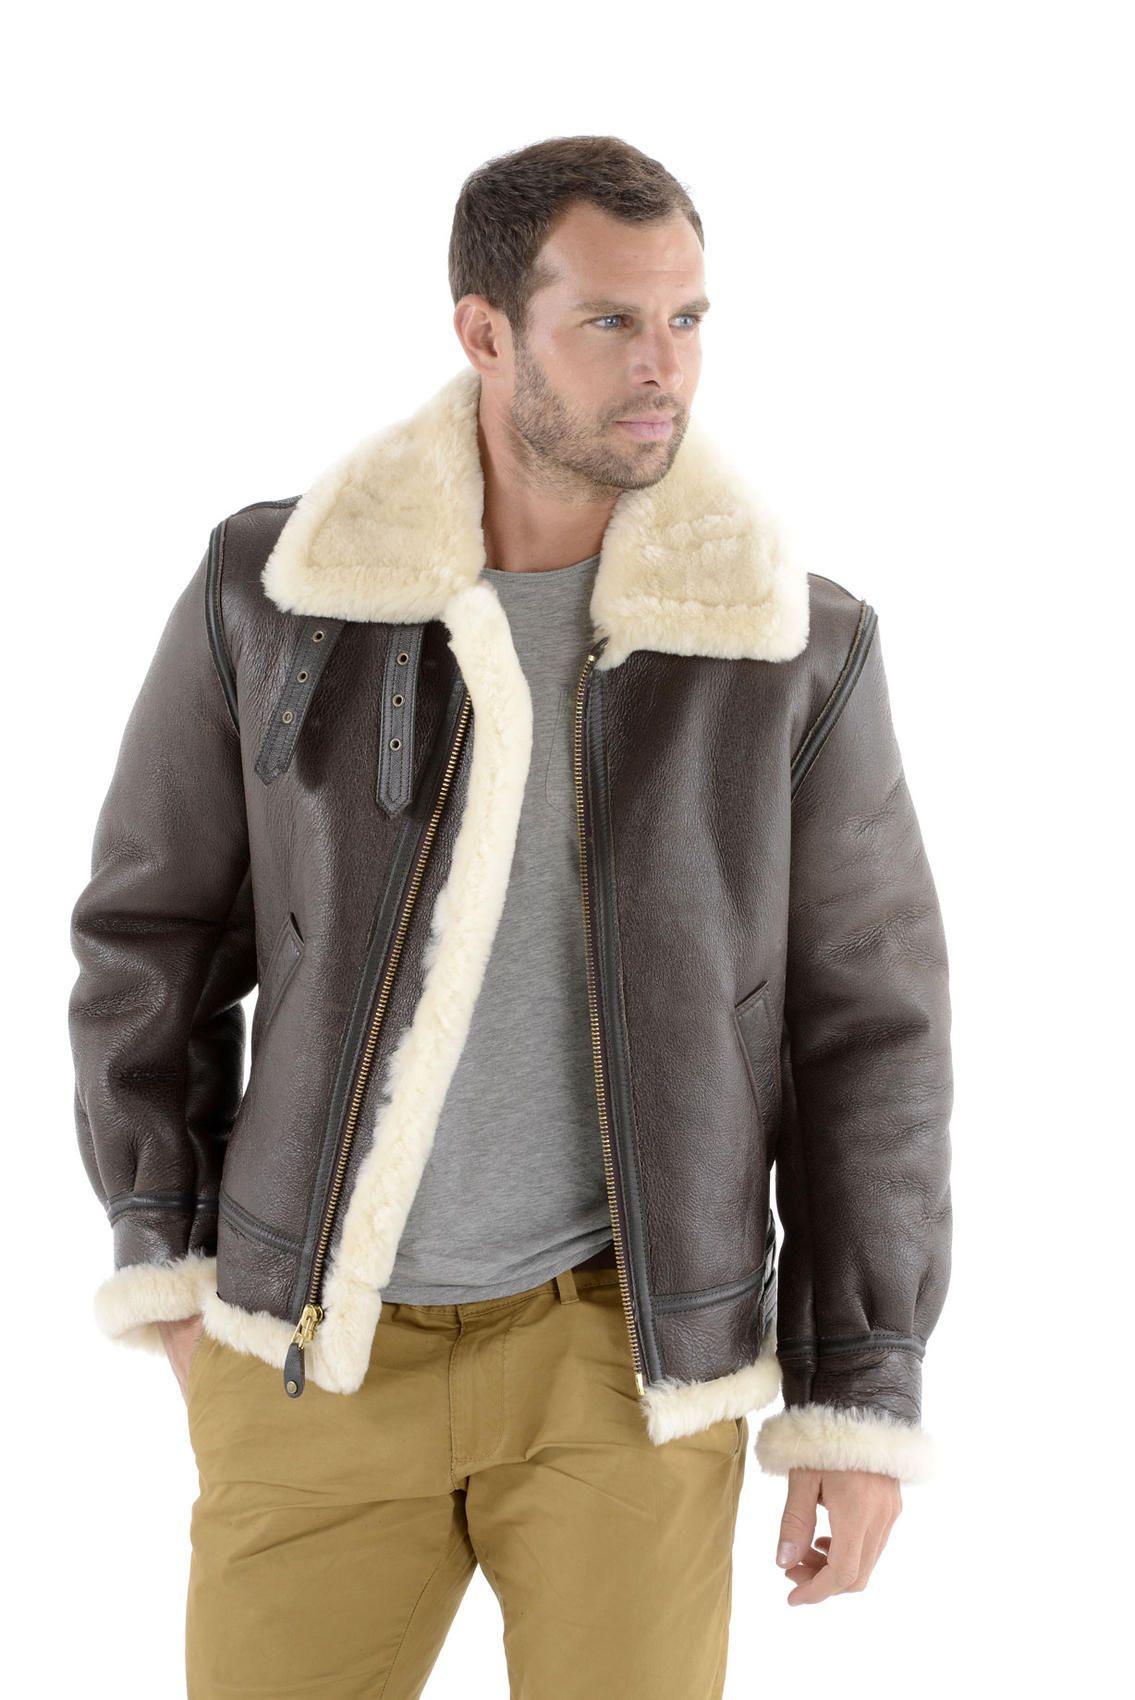 Vêtement en cuir Blousons SCHOTT marron   Mecs en blouson bombardier ... 0cedd757c71